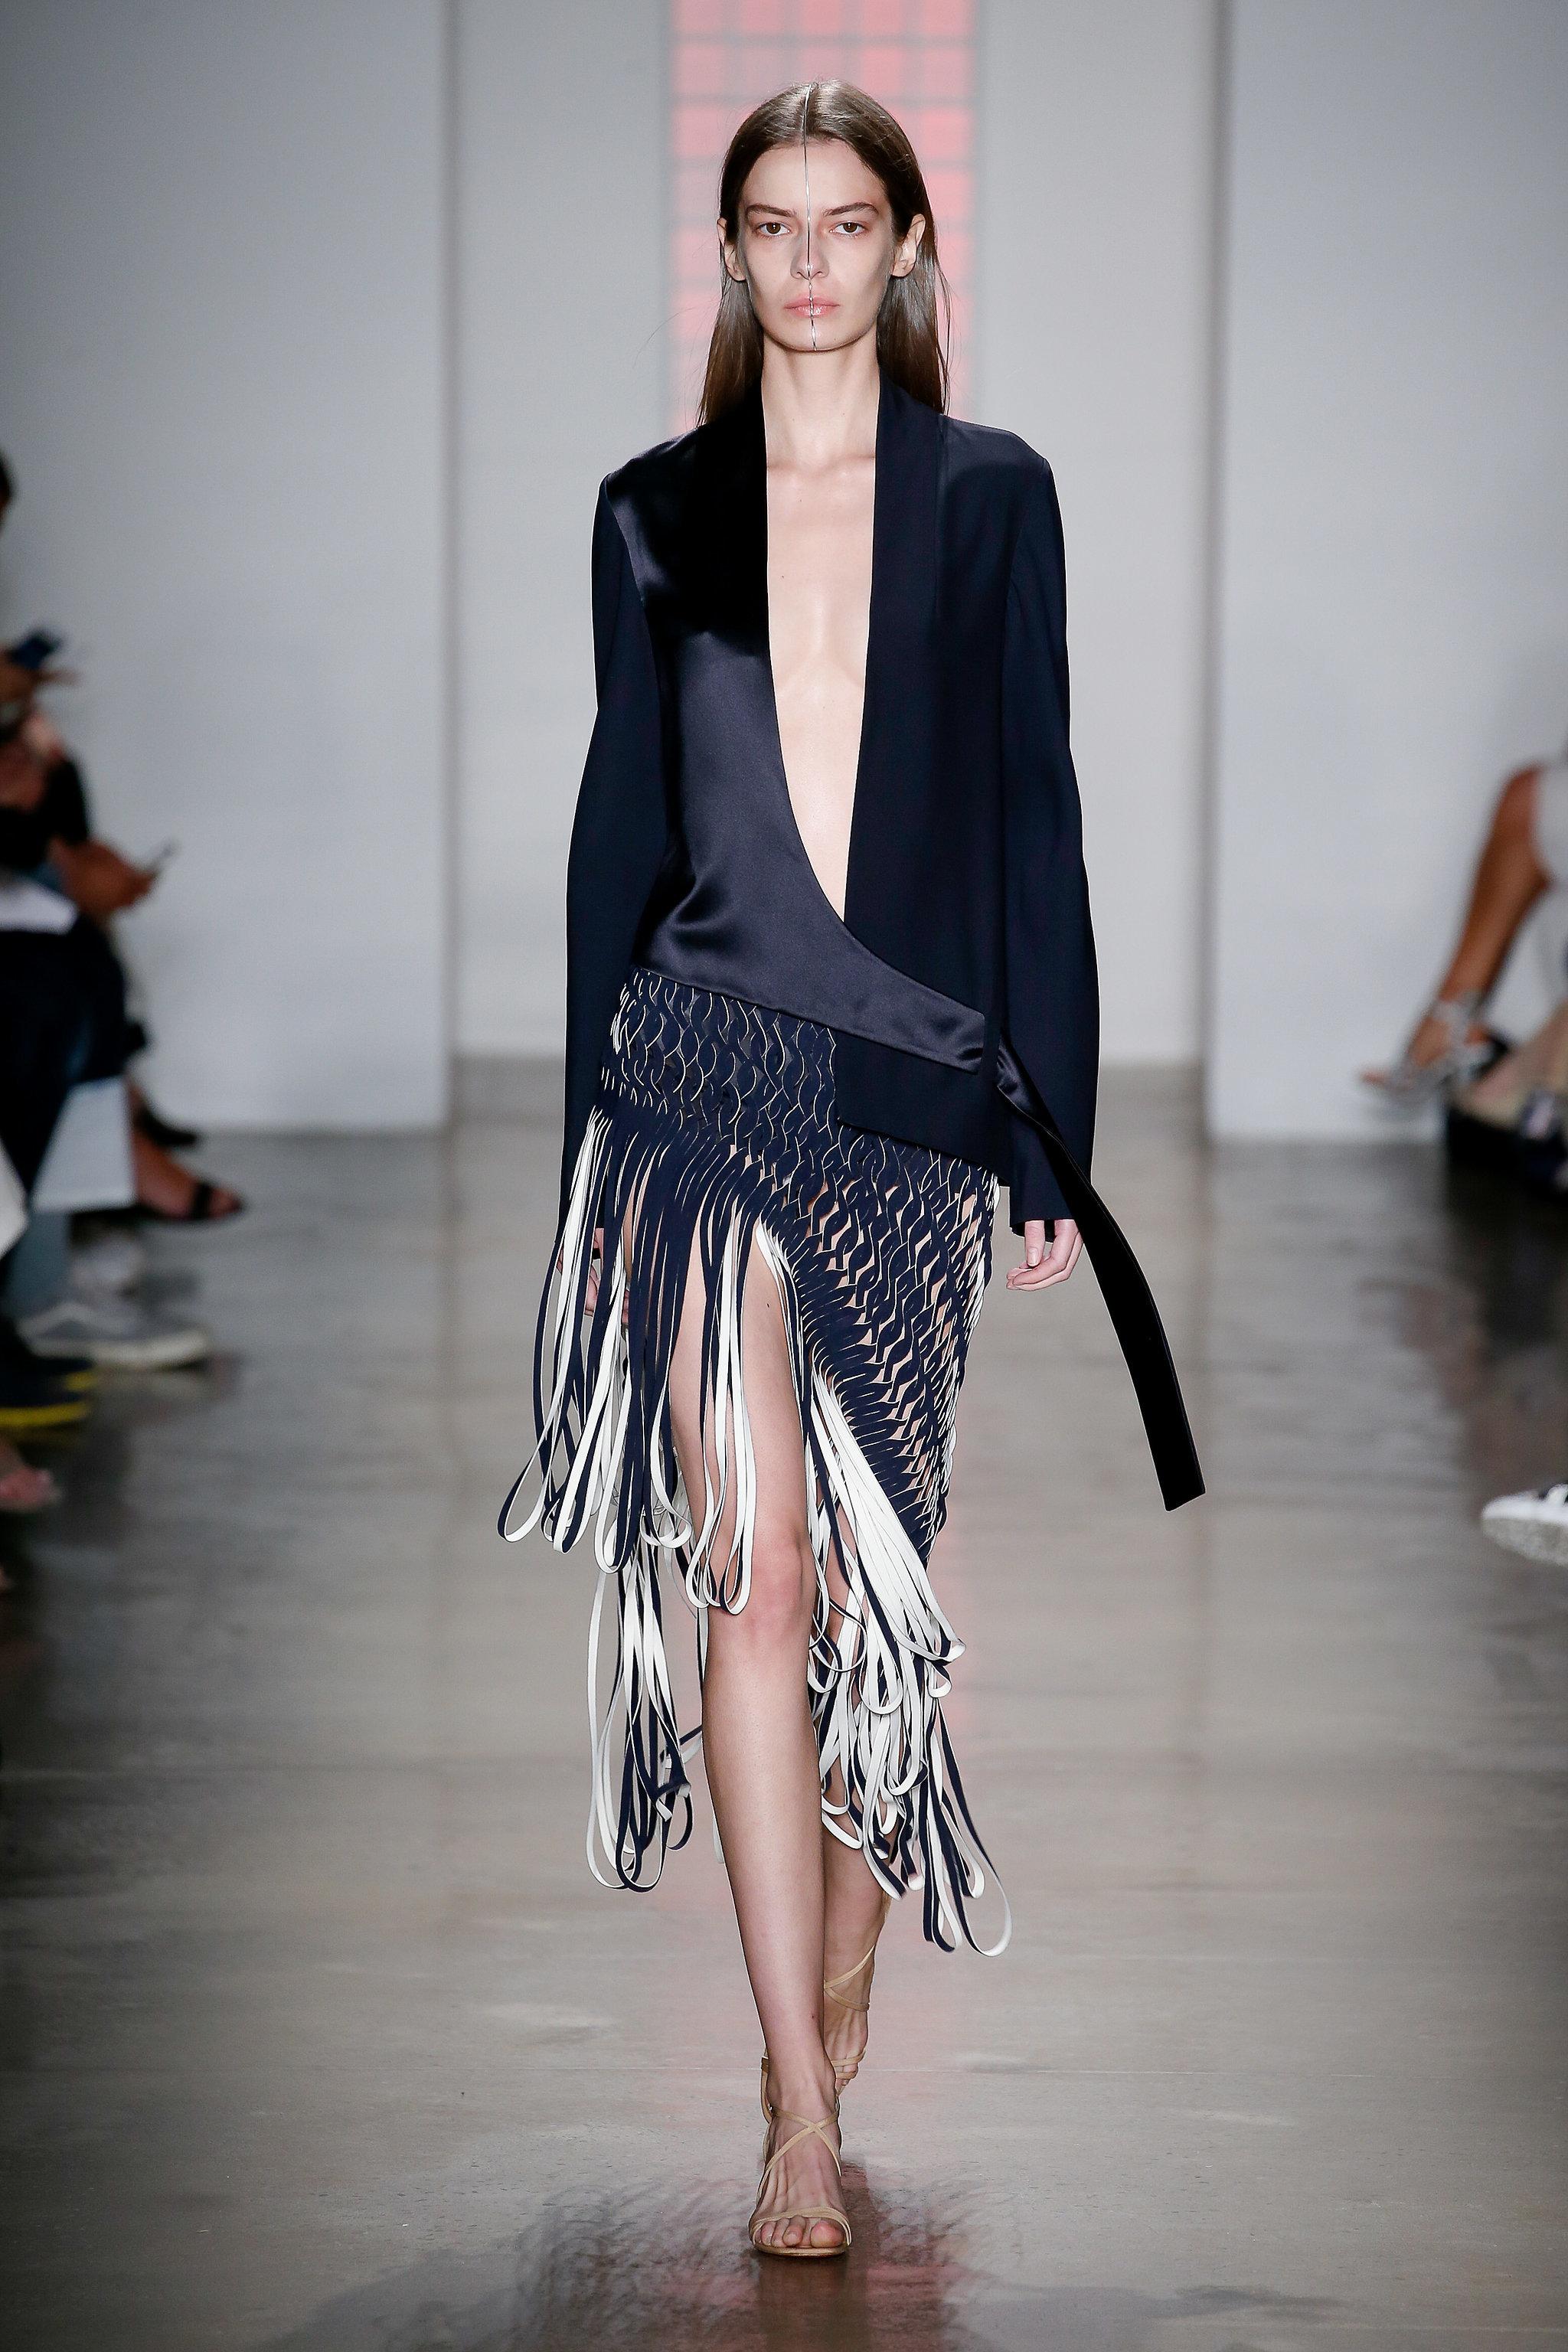 Dion-Lee-New-York-Fashion-Week-Spring-Summer-2016-Runway